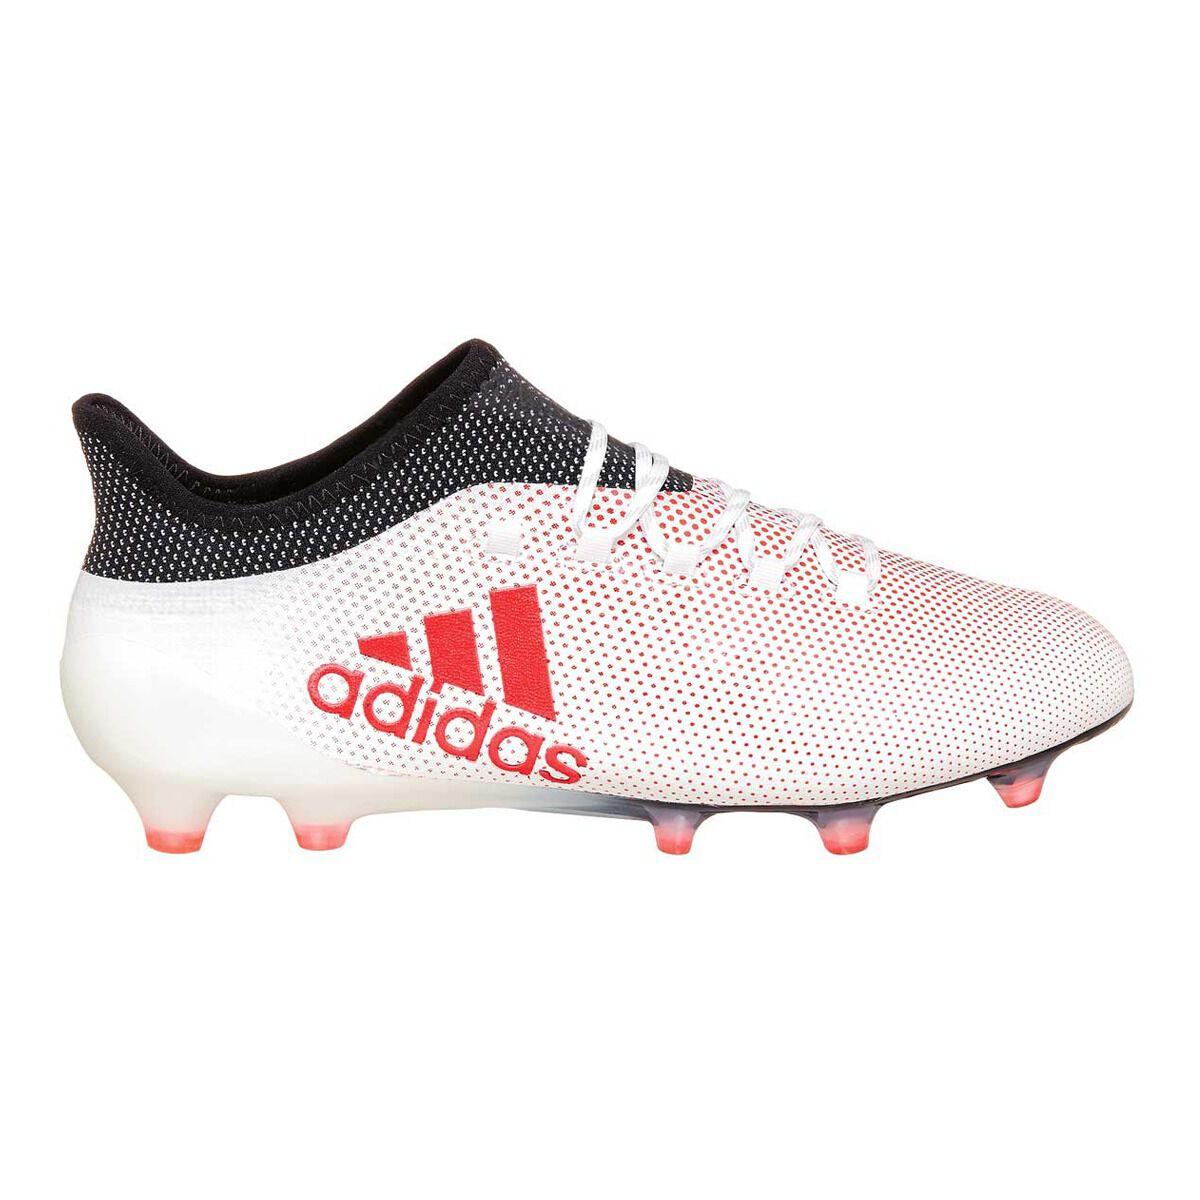 ece09f8a33a ... good adidas x 17.1 fg mens football boots grey red us 7 adult grey  969db c3571